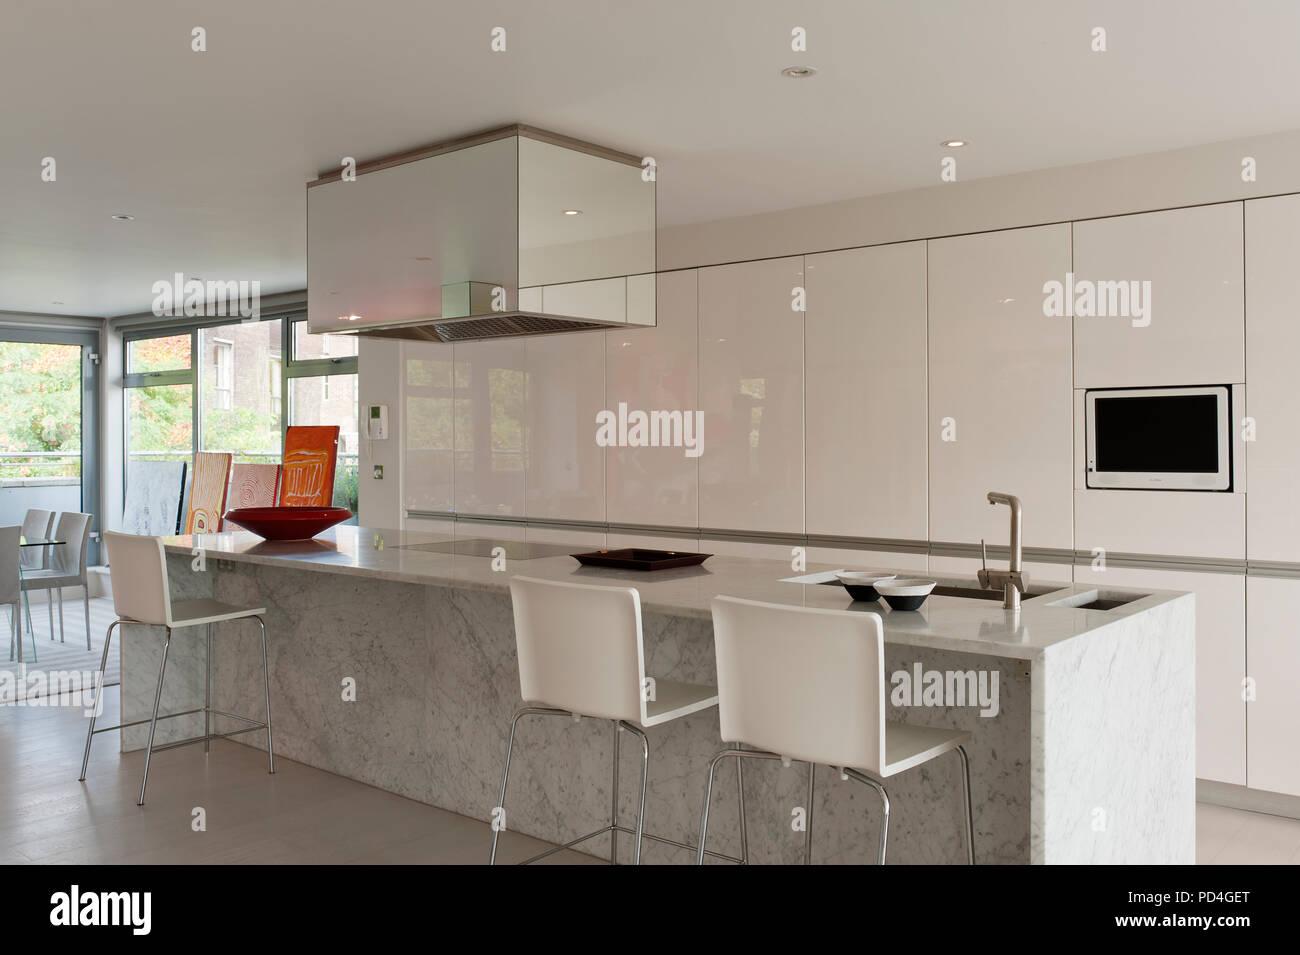 Moderne Küche mit Insel Stockfoto, Bild: 214615712 - Alamy